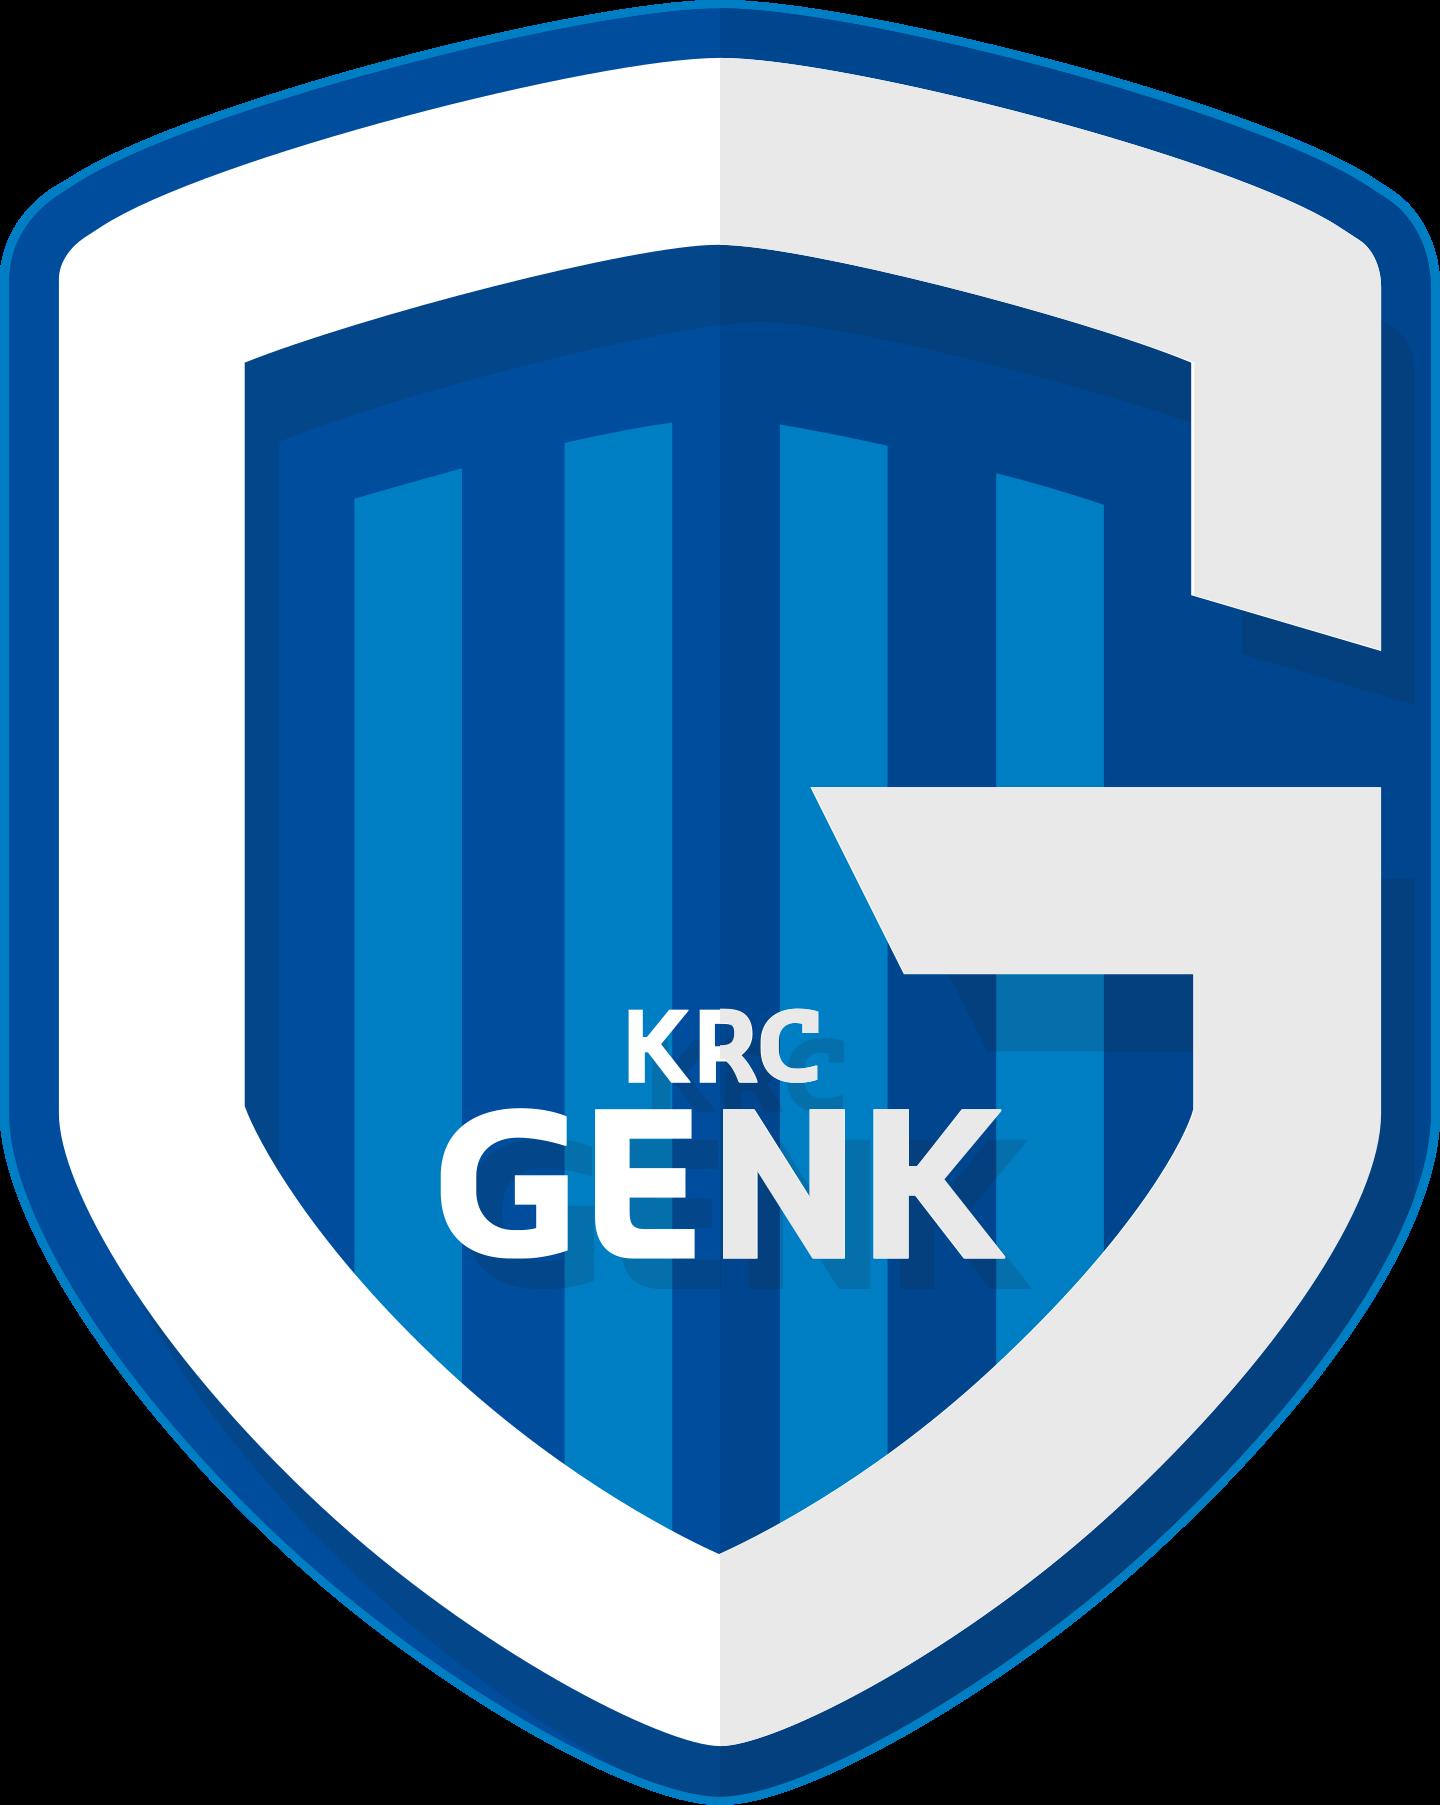 club genk logo 2 - K.R.C. Genk Logo